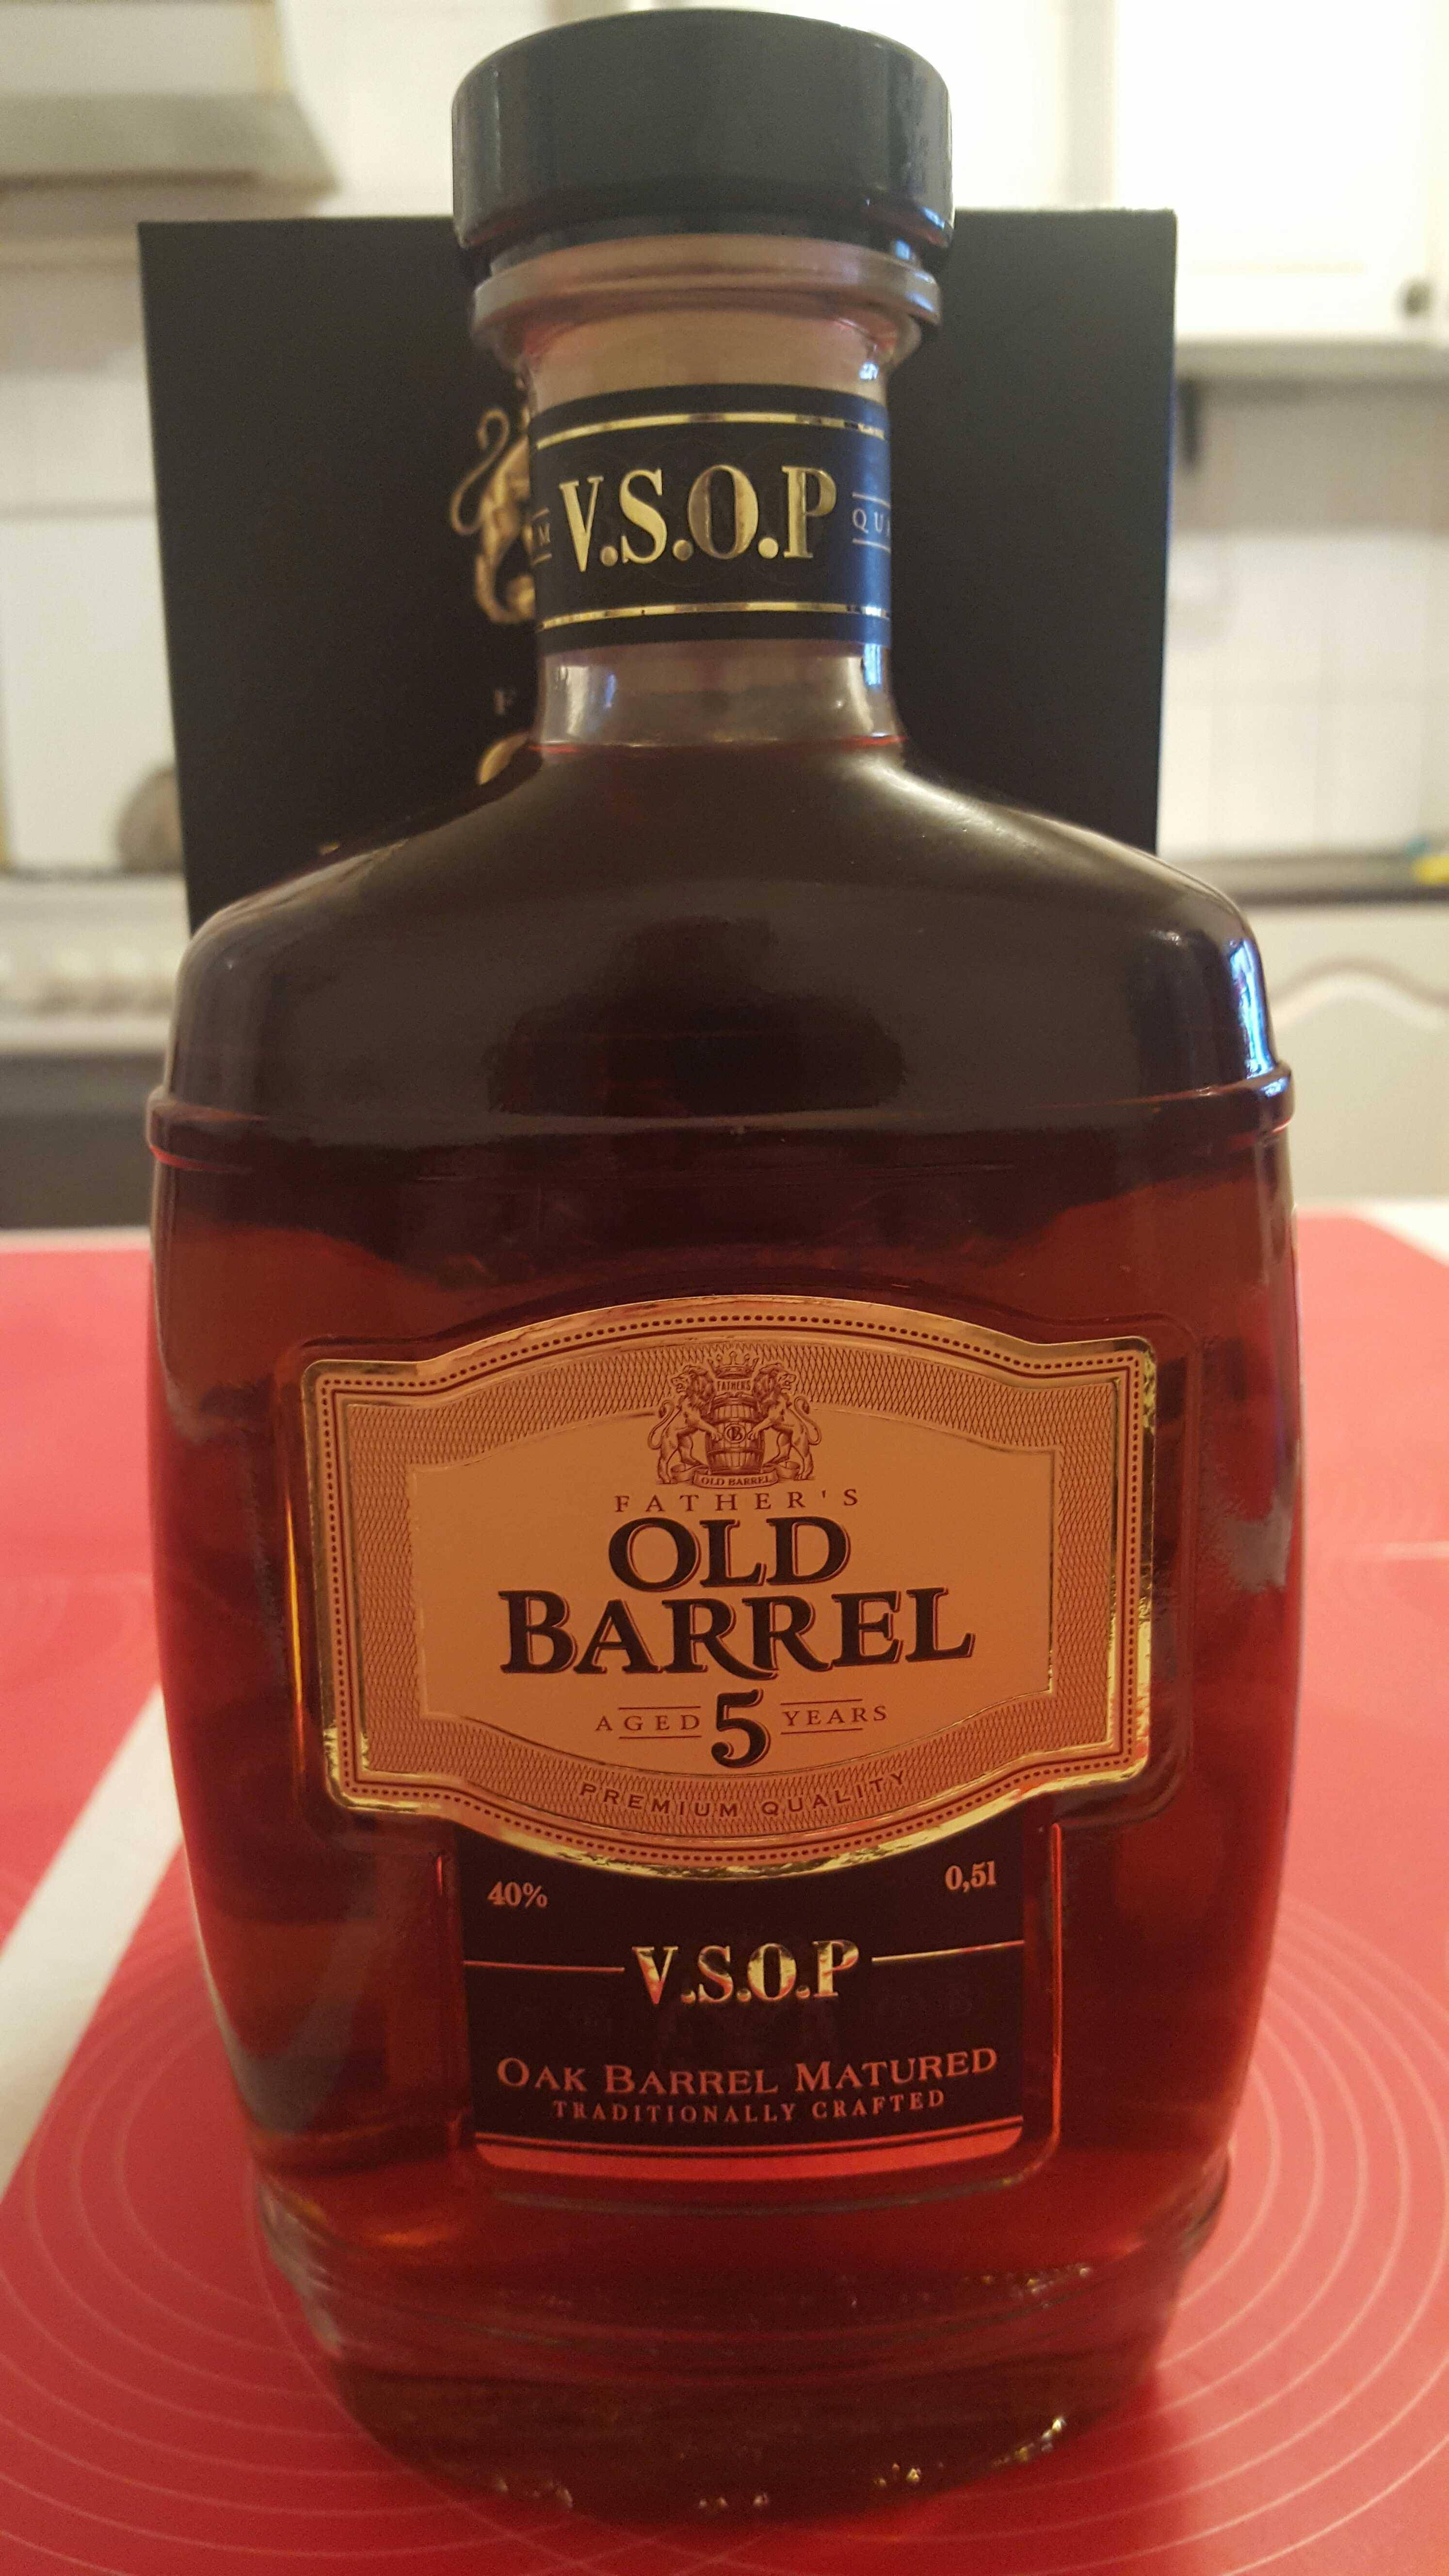 Коньяк father's old barrel (фазерс олд баррель) – описание